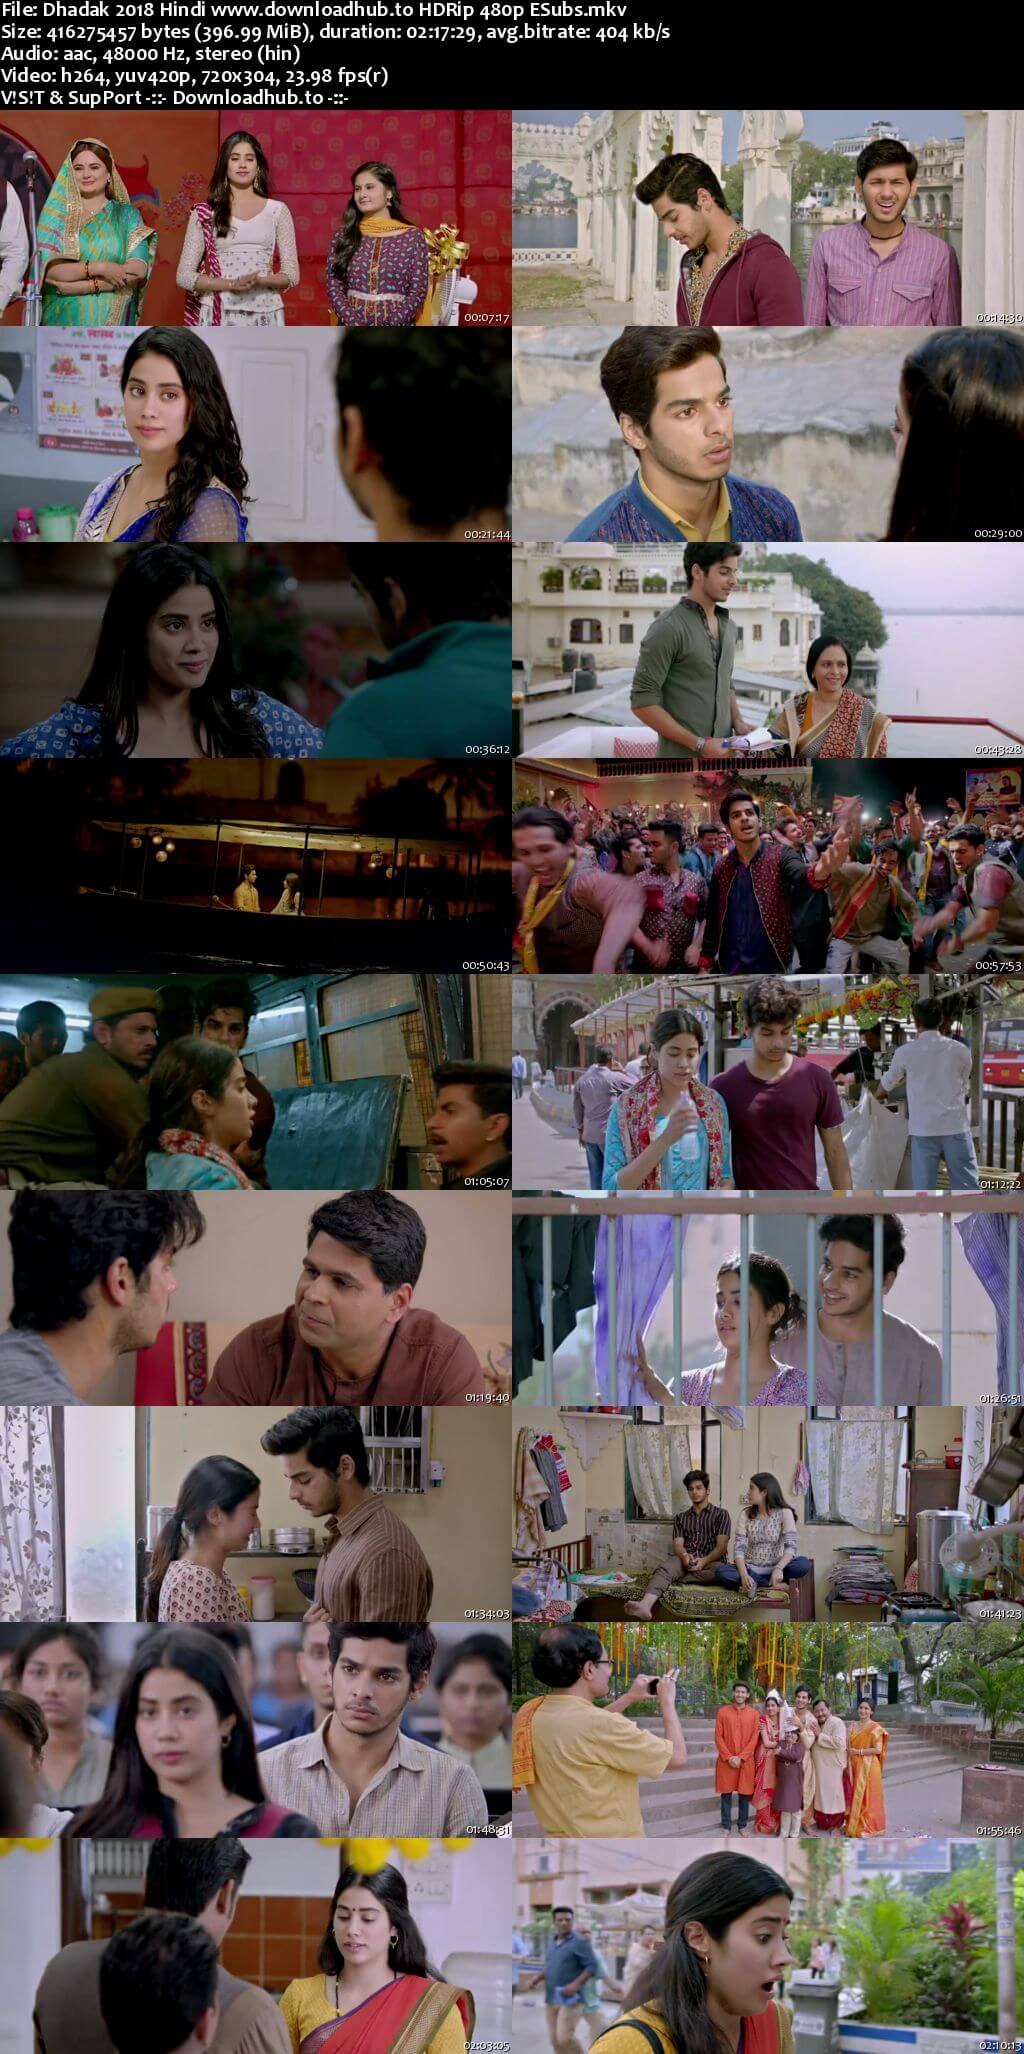 Dhadak 2018 Hindi 400MB HDRip 480p ESubs